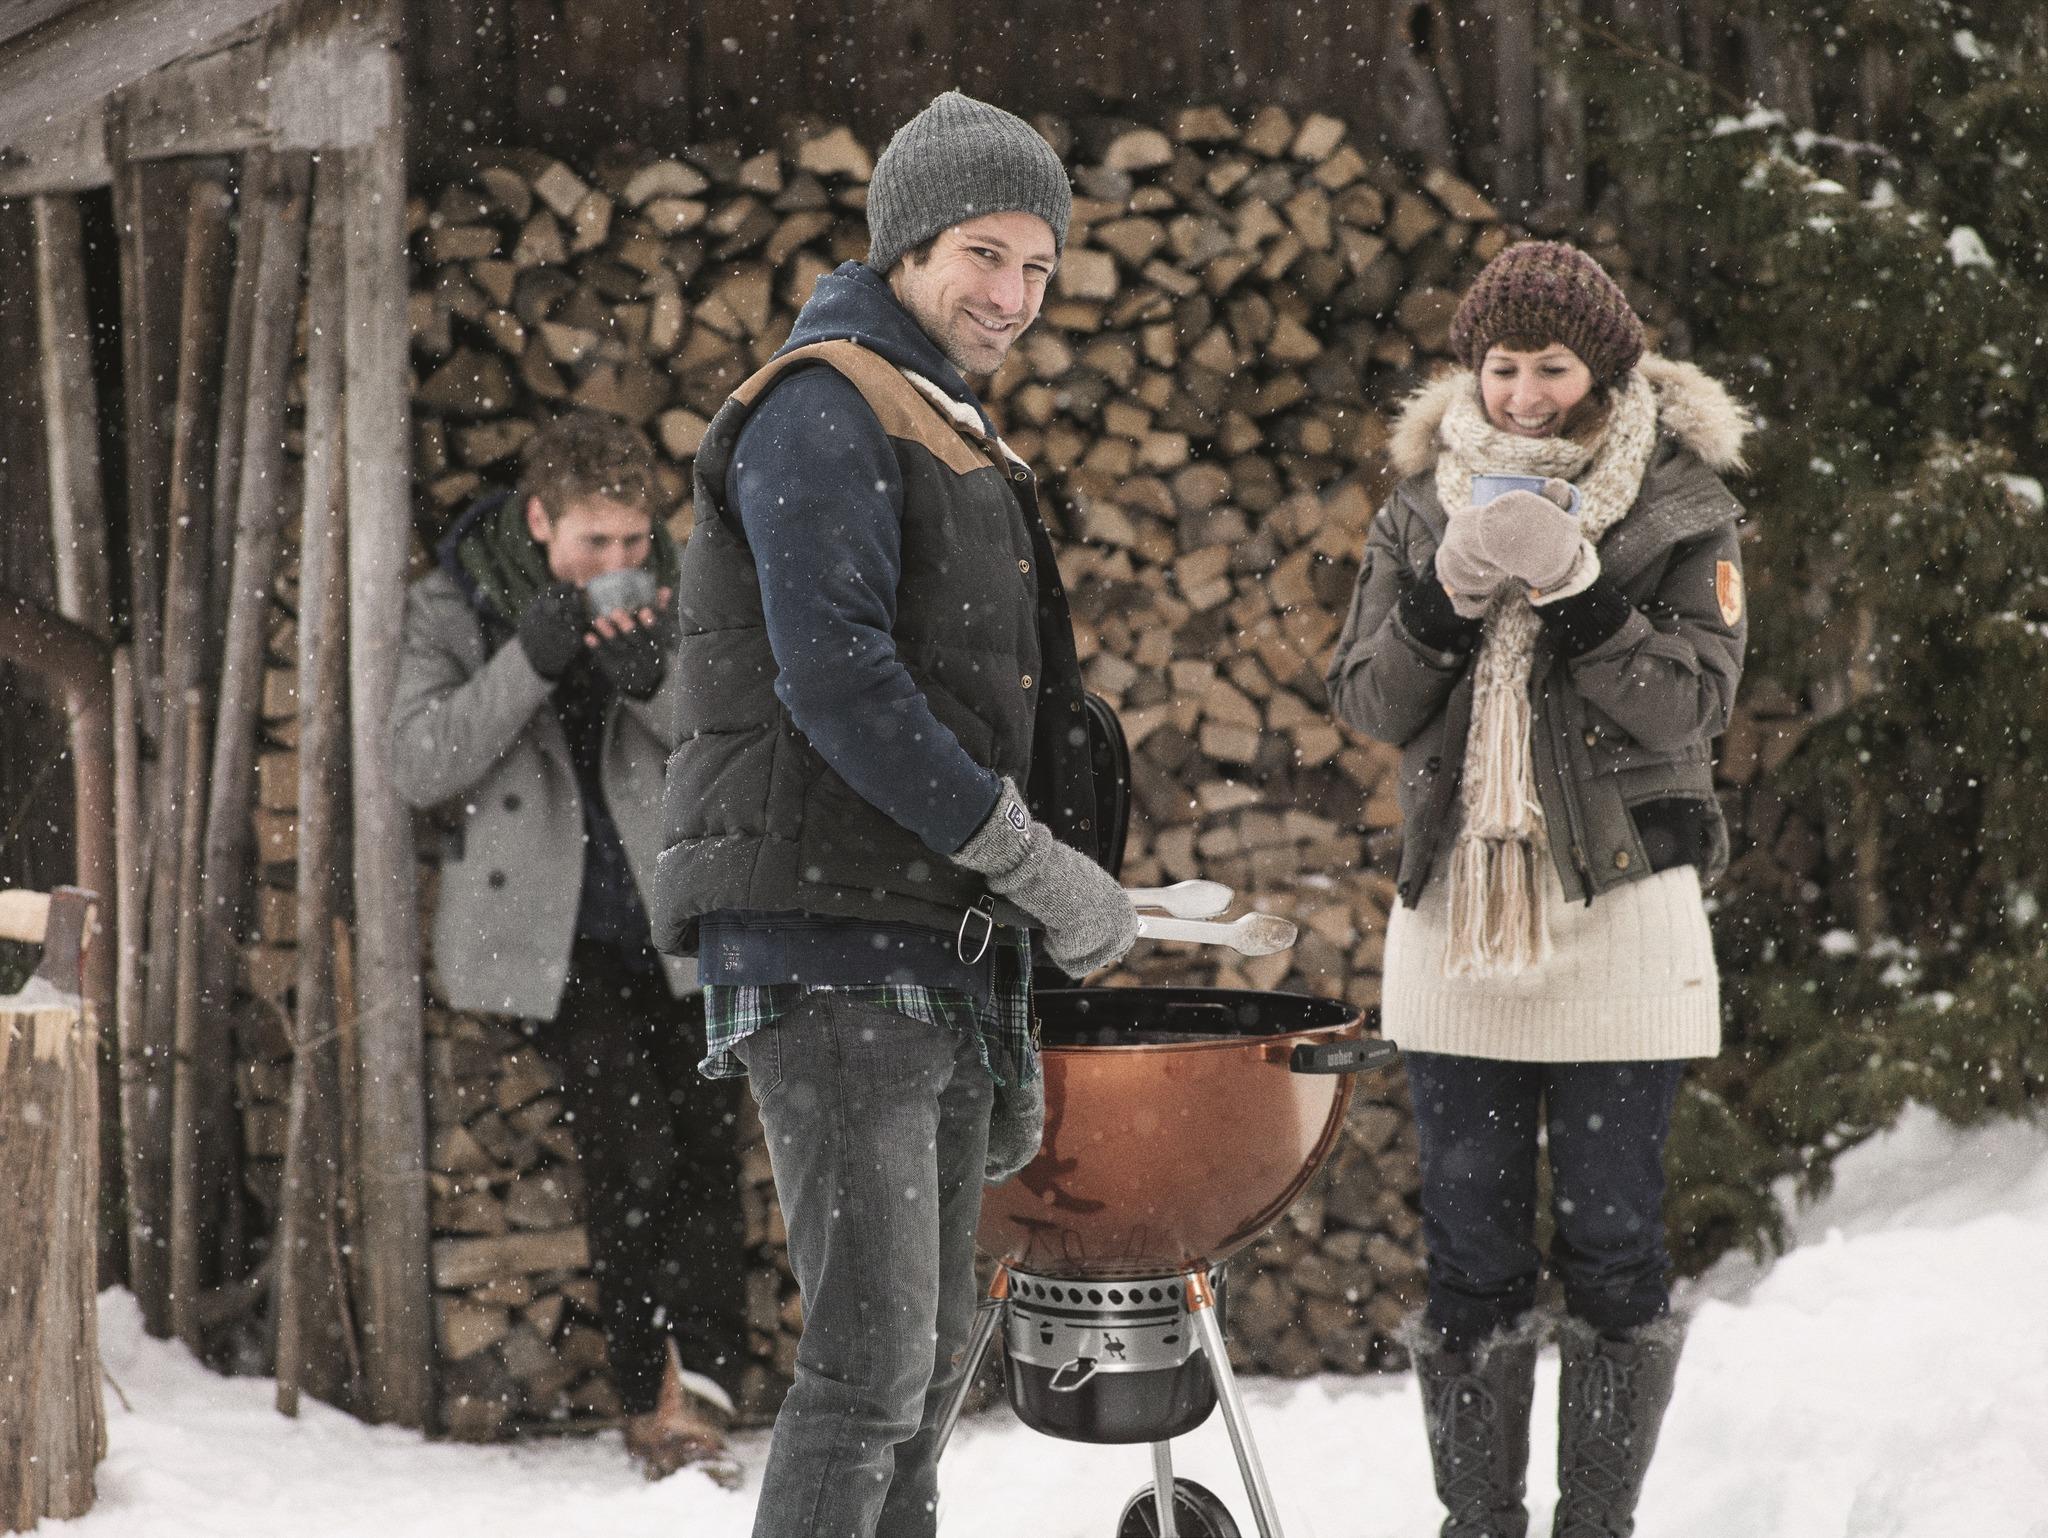 grillen im winter so geht 39 s richtig neubau. Black Bedroom Furniture Sets. Home Design Ideas